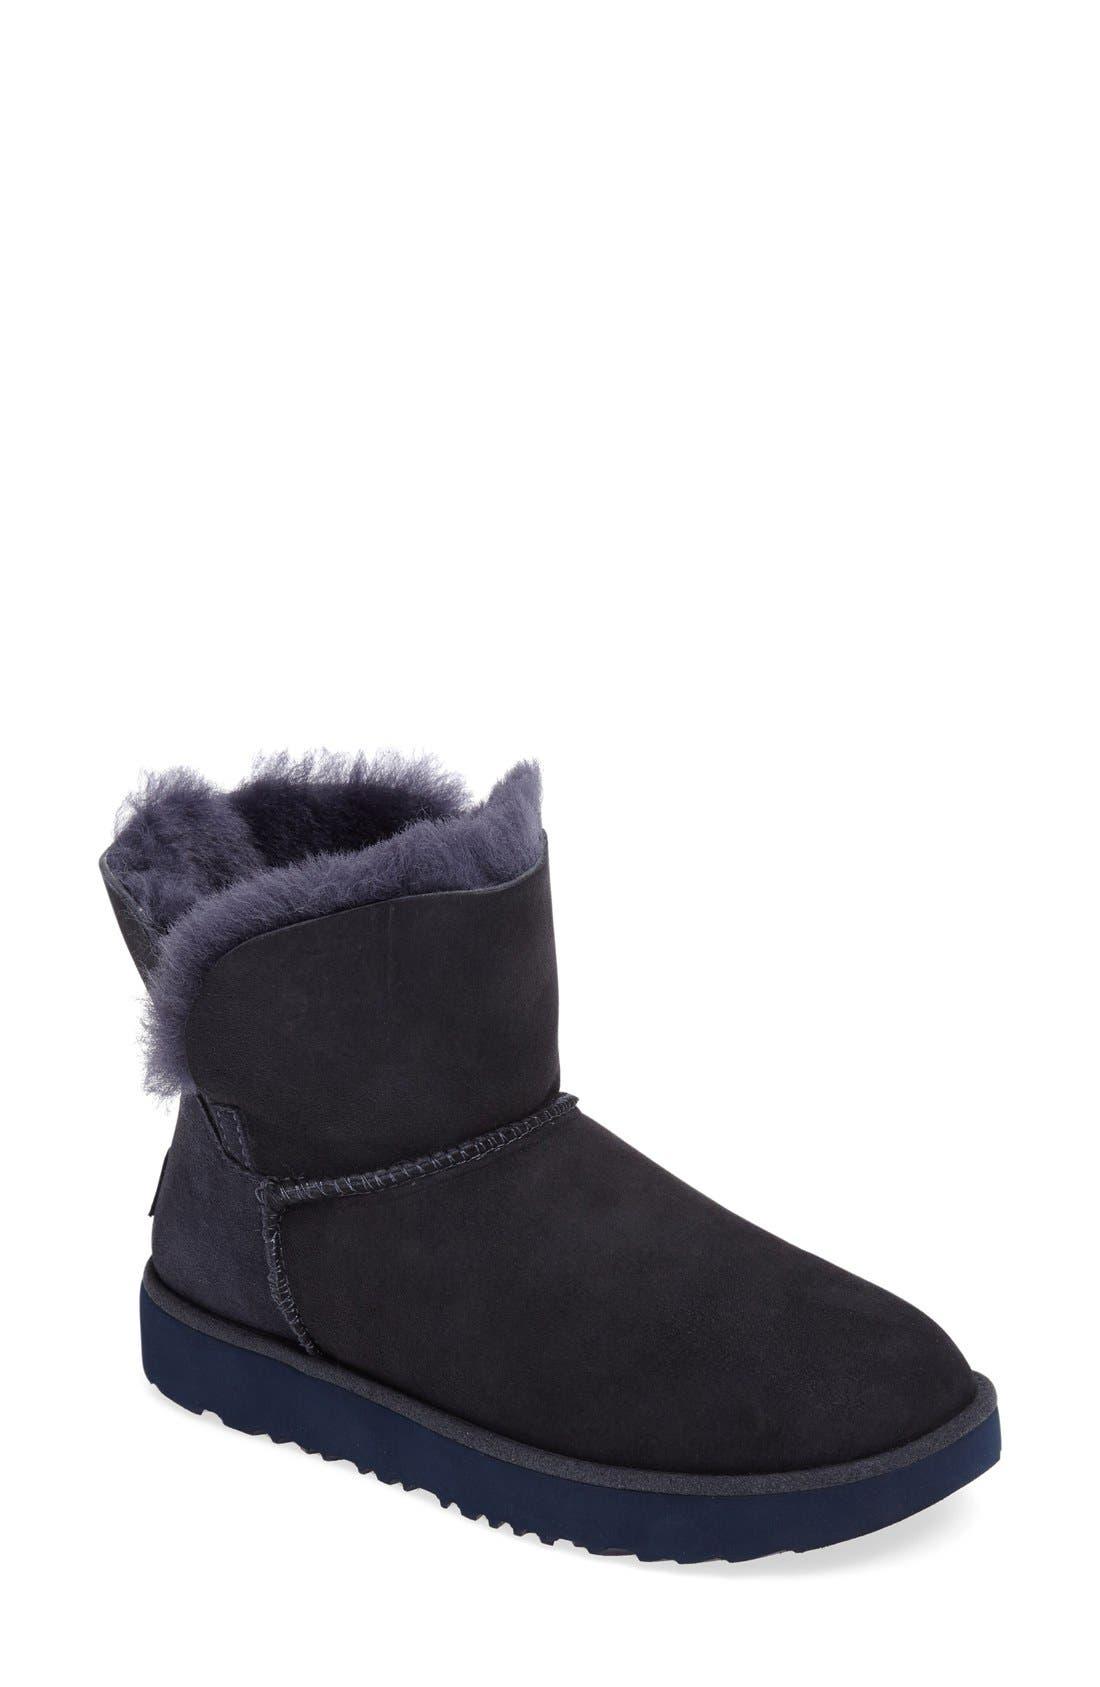 Alternate Image 1 Selected - UGG® Classic Cuff Mini Boot (Women)